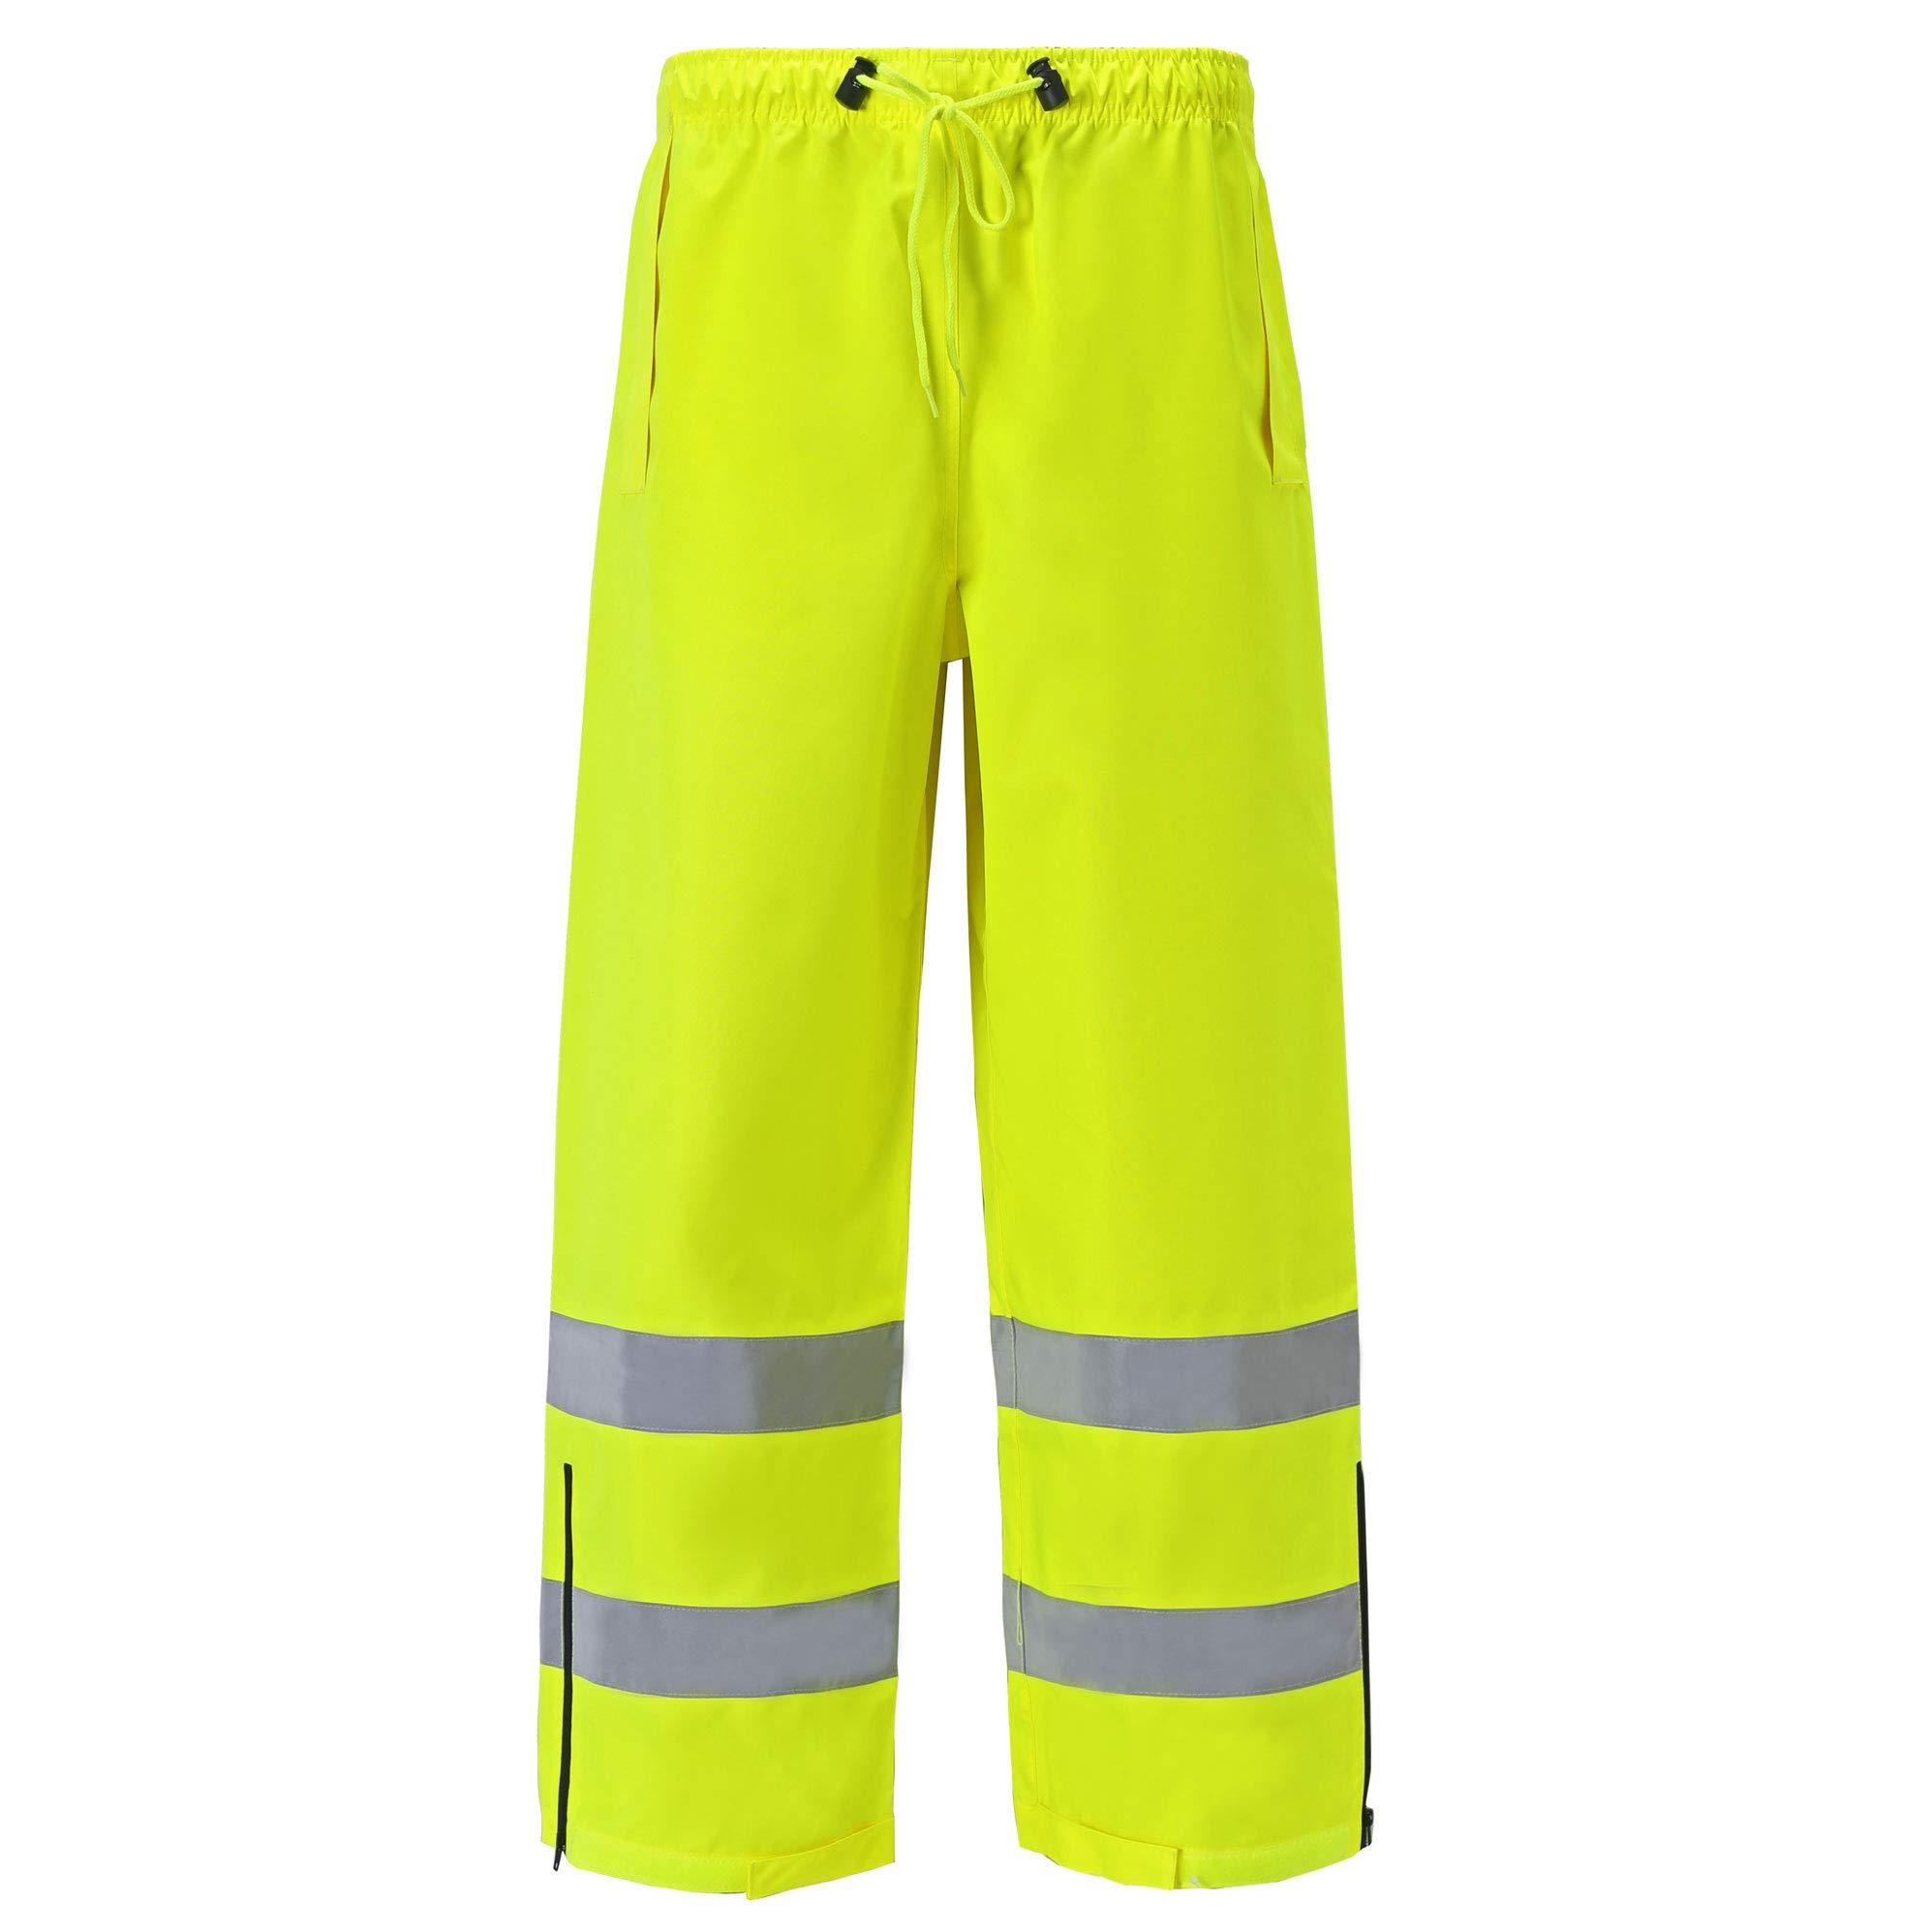 High Viz Rain Pants for Men and Women Waterproof Work Wear Water Resistant Ansi Class E Two Tone (Medium, Lime Yellow, 1 Piece)